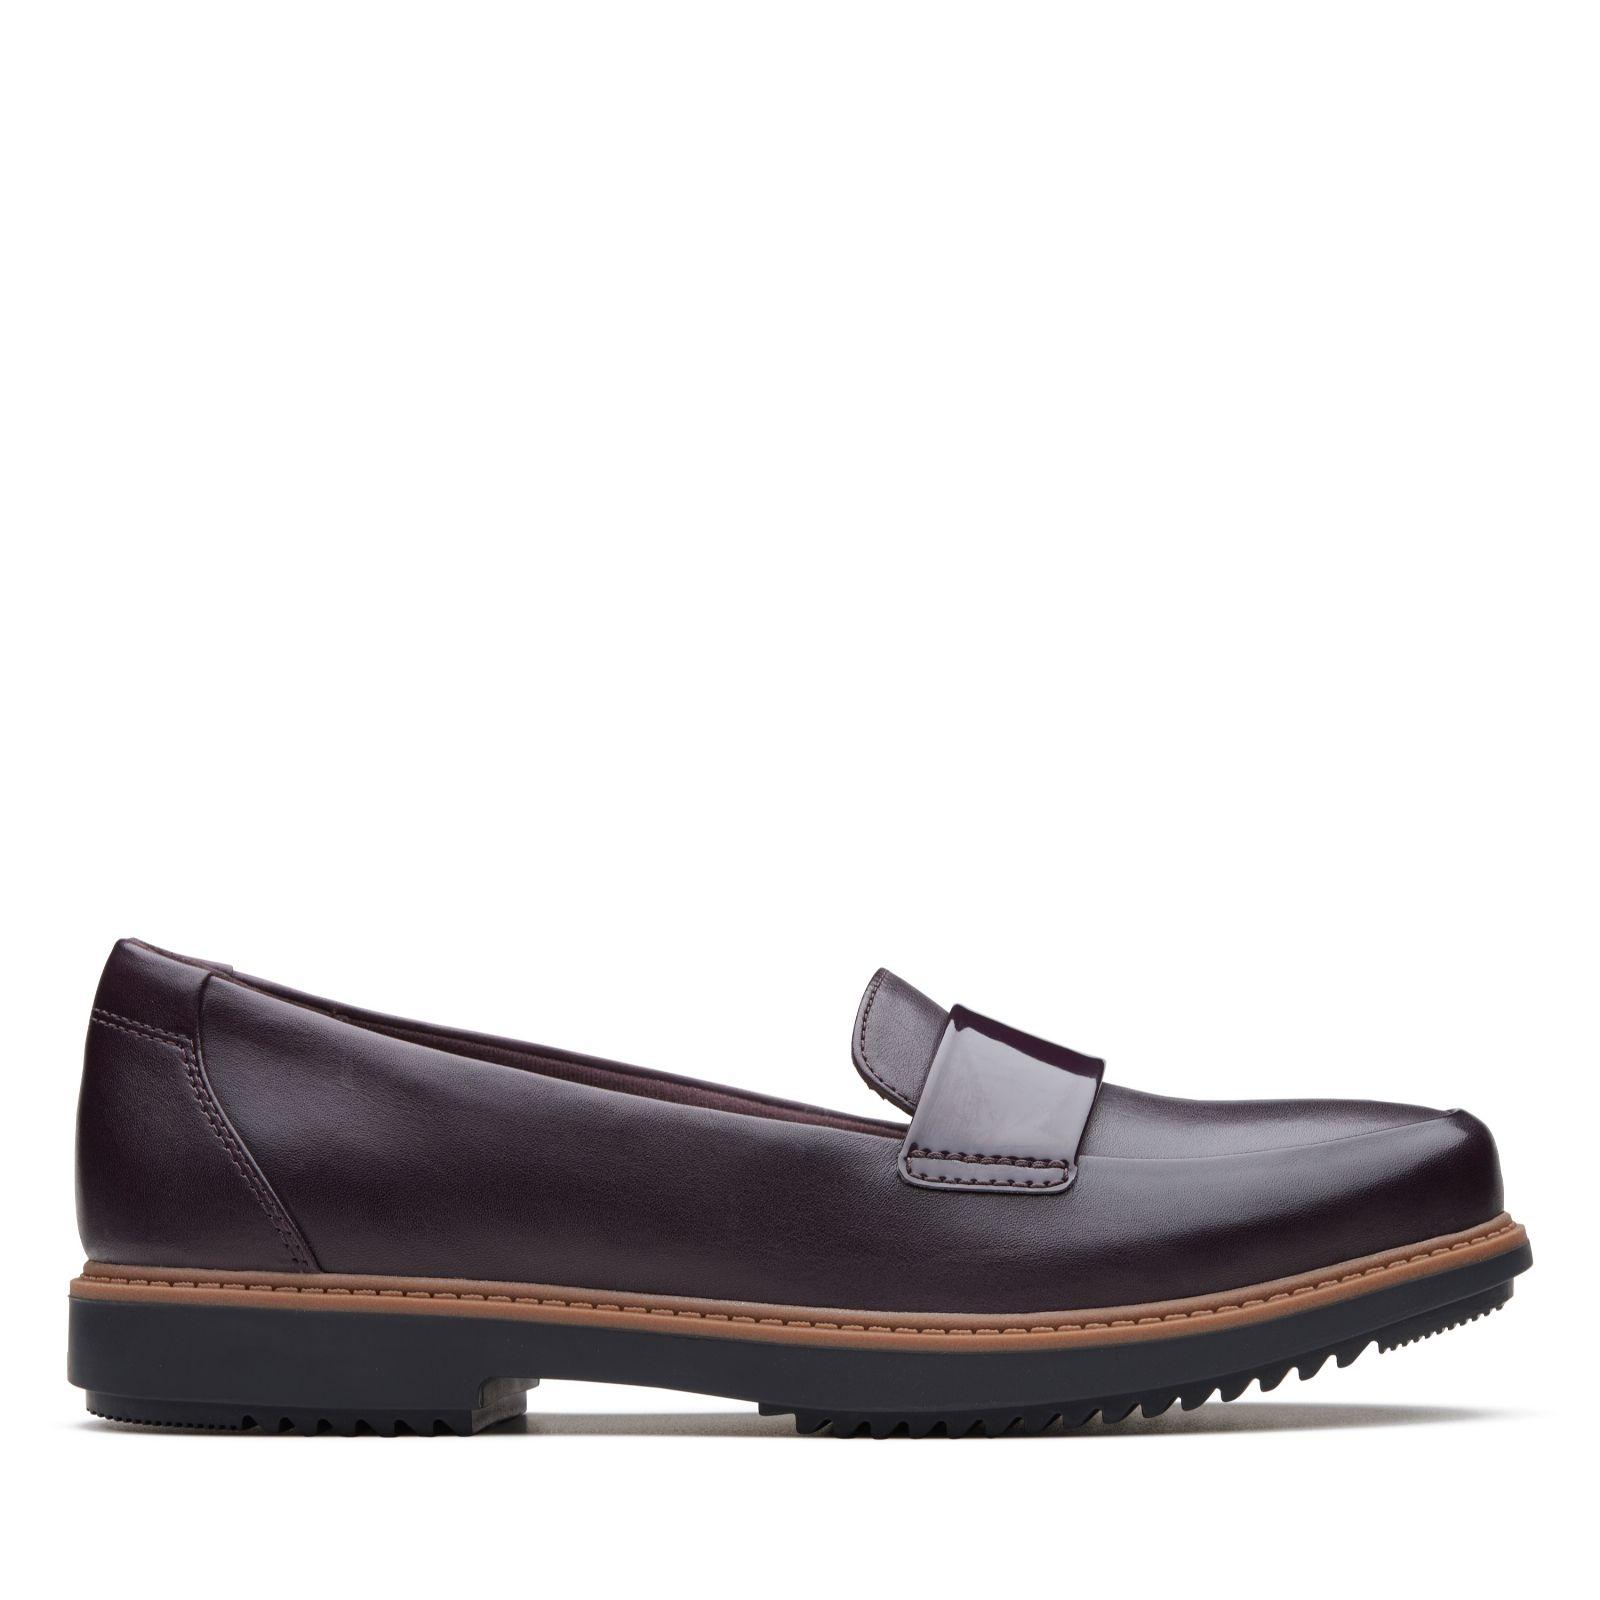 82082daa0da Clarks Raisie Arlie Leather Loafer Standard Fit - QVC UK